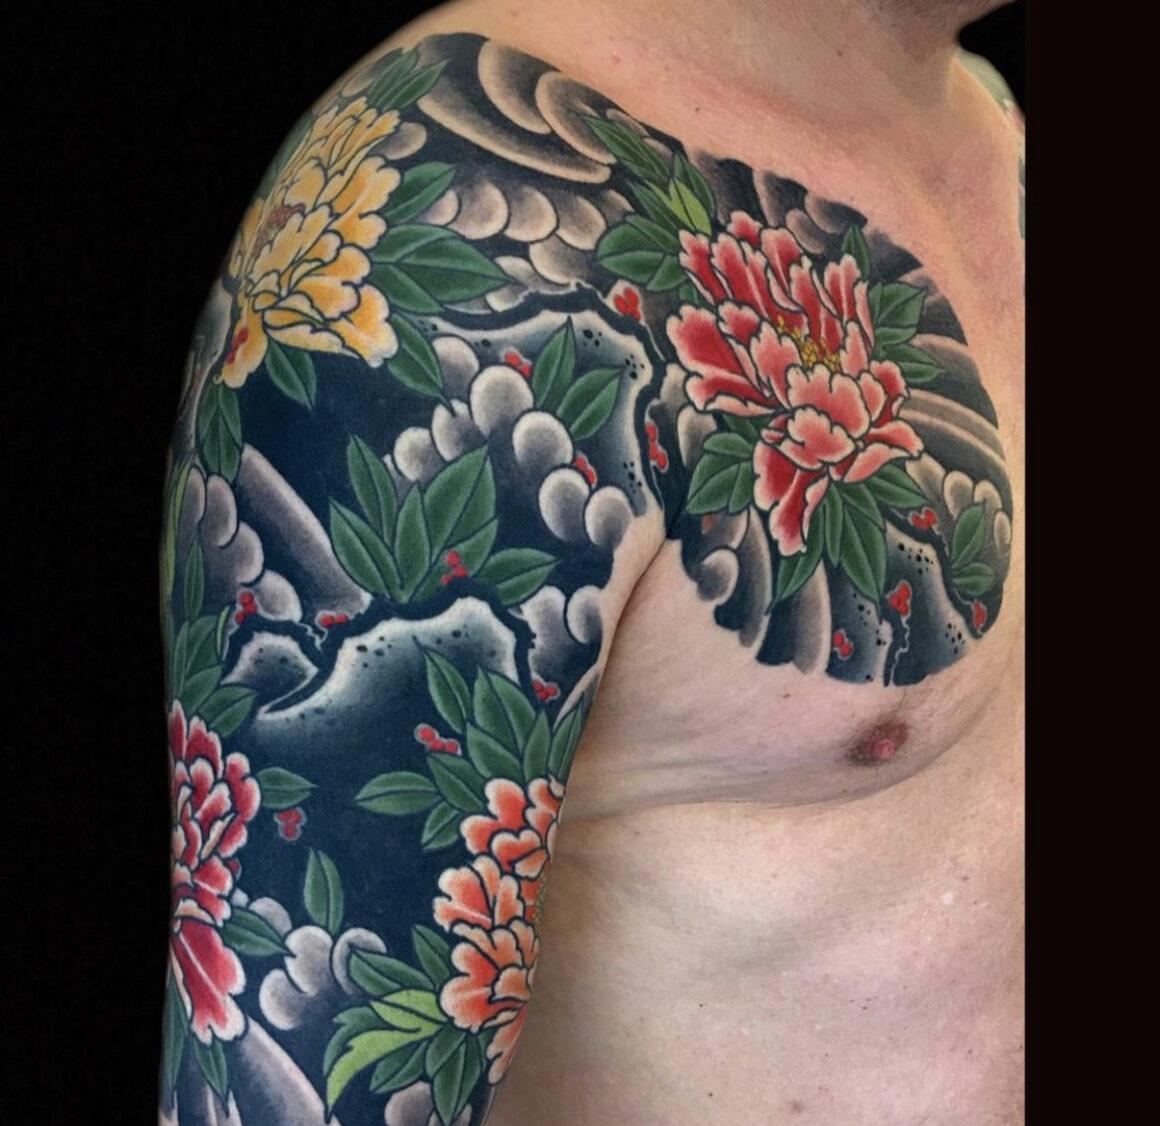 Henning Jorgensen, Royal Tattoo, Helsingor, Denmark